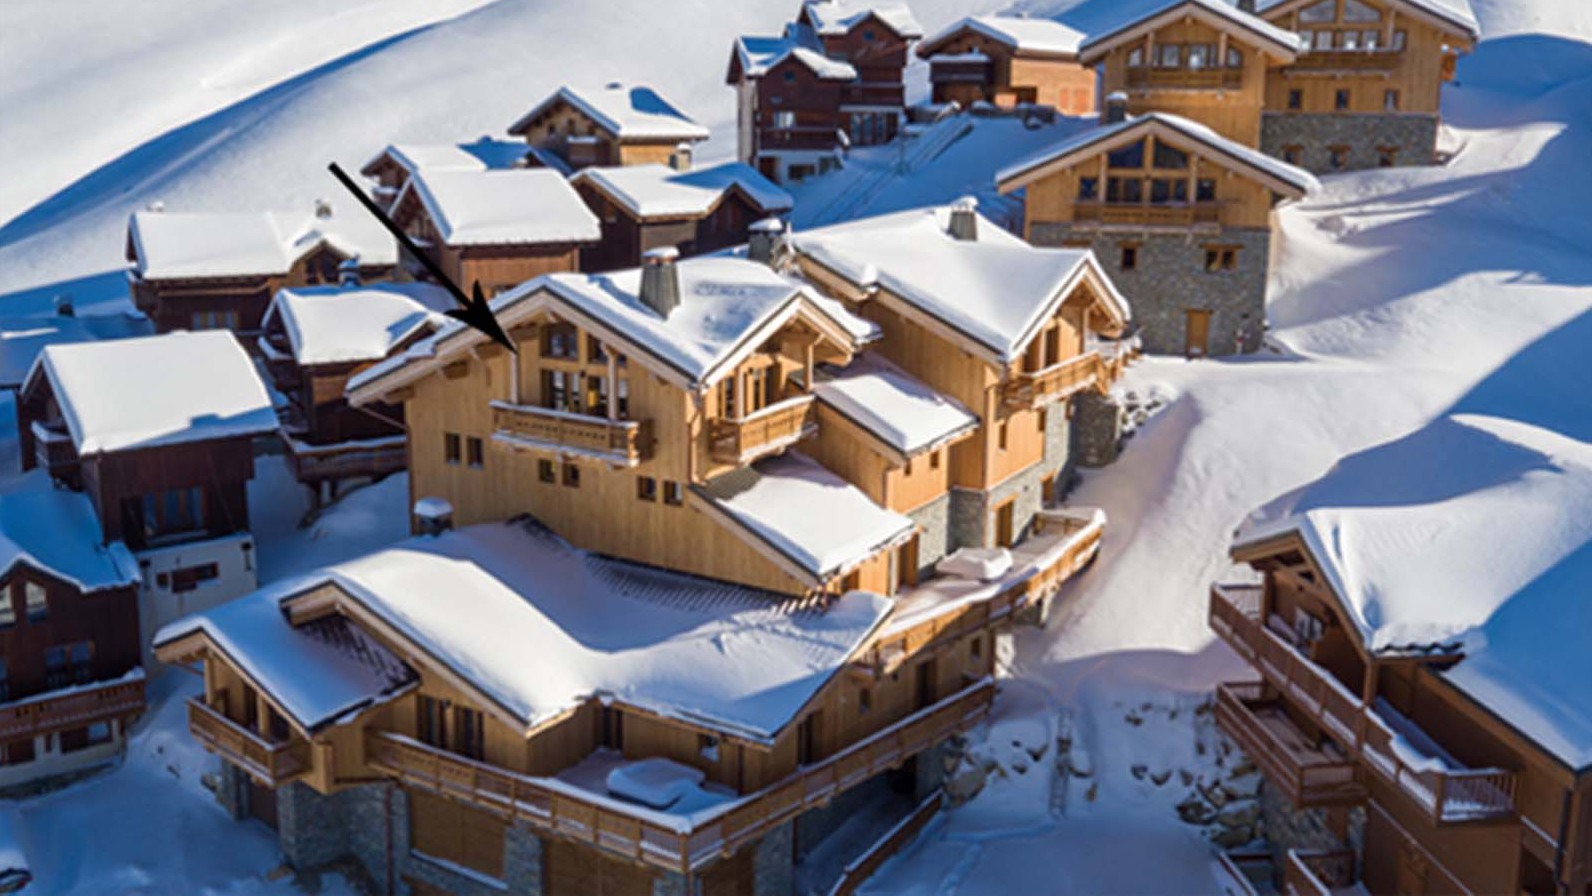 Exterior - Chalet Hepatica - Ski Chalet in La Plagne, France